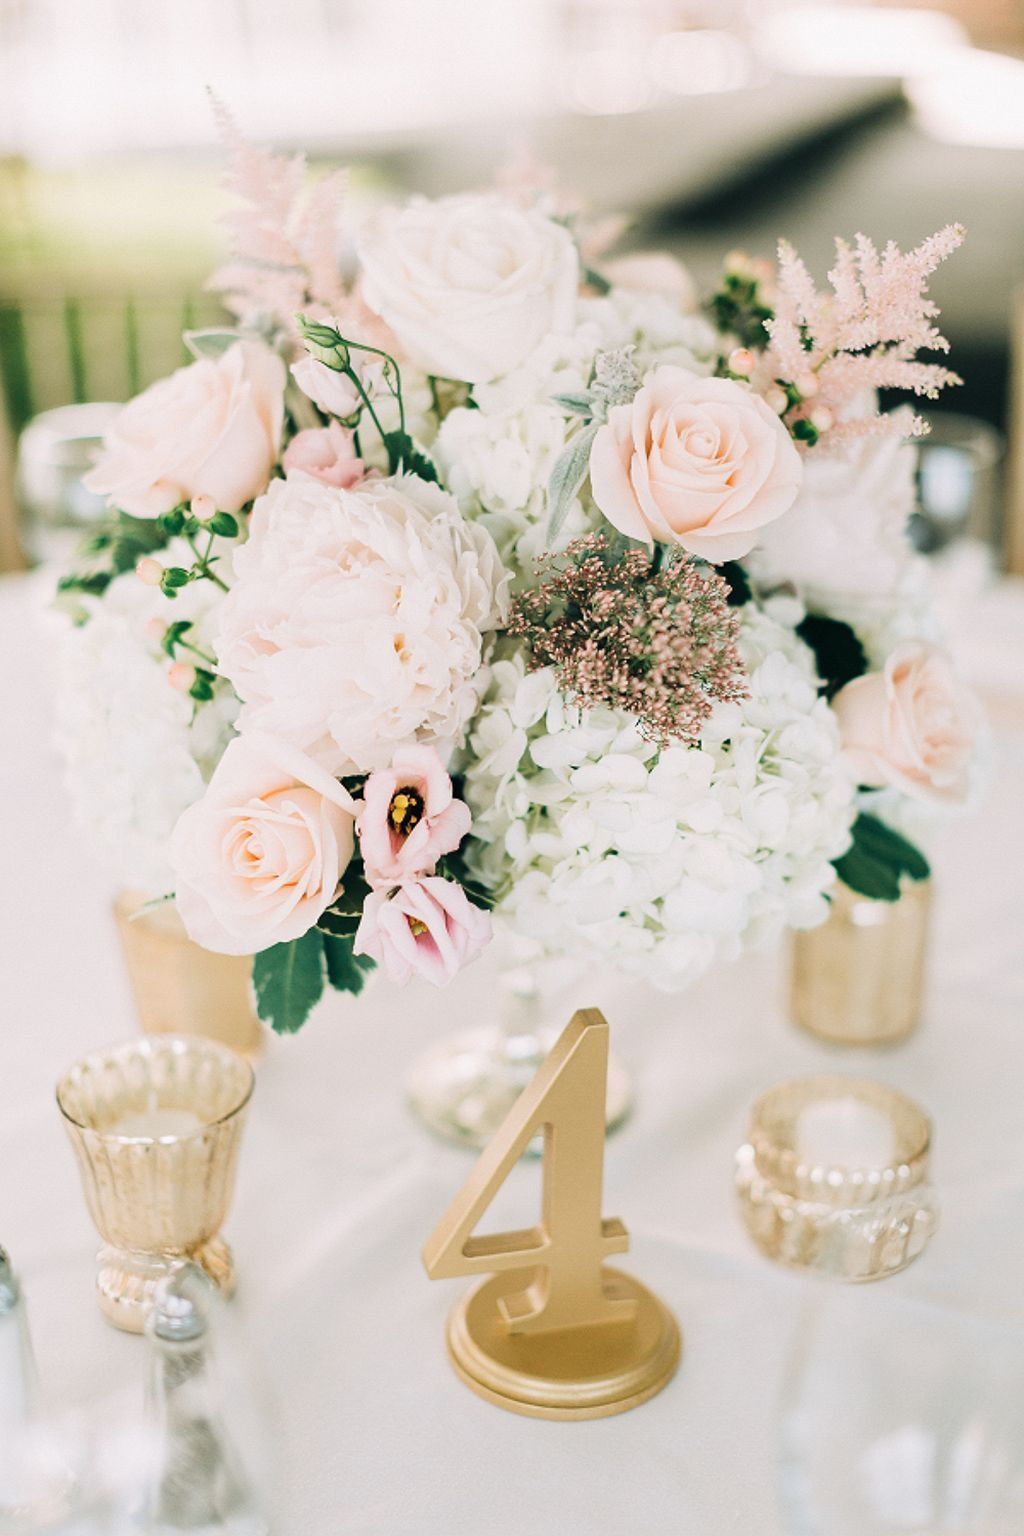 30+ Greenery Wedding Theme Ideas | Theme ideas, Greenery and Weddings